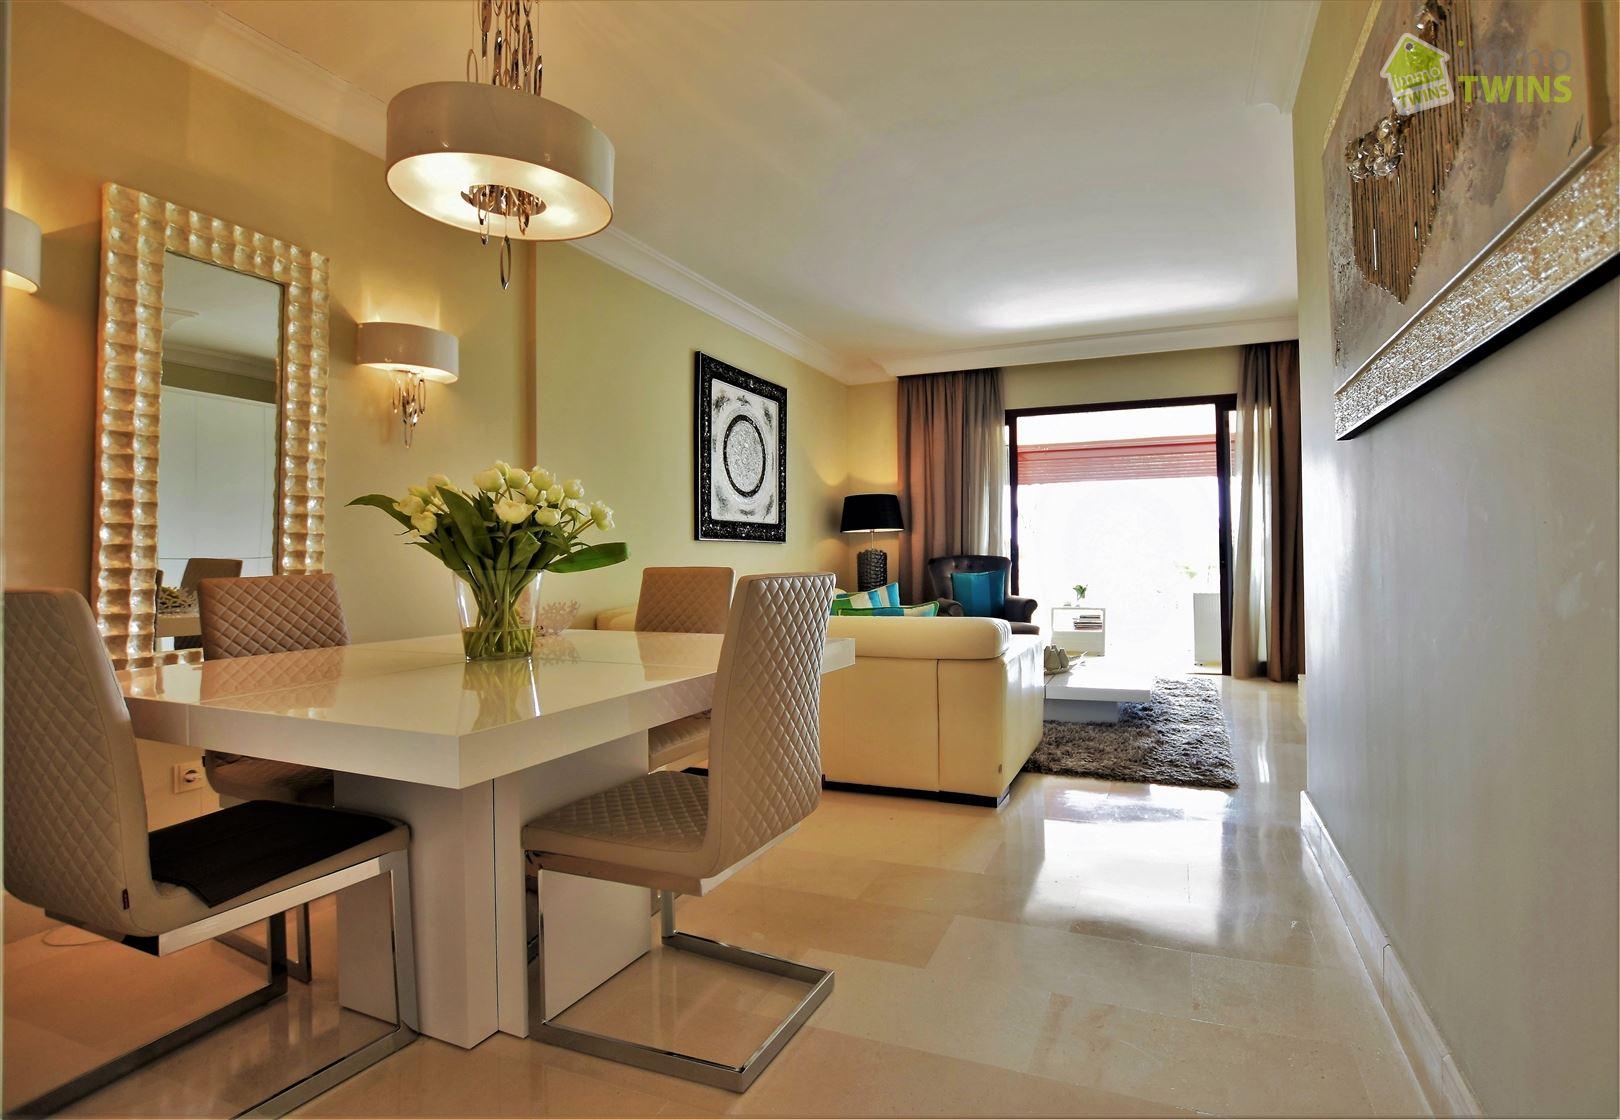 Foto 4 : Appartement te 29679 MARBELLA (Spanje) - Prijs € 485.000